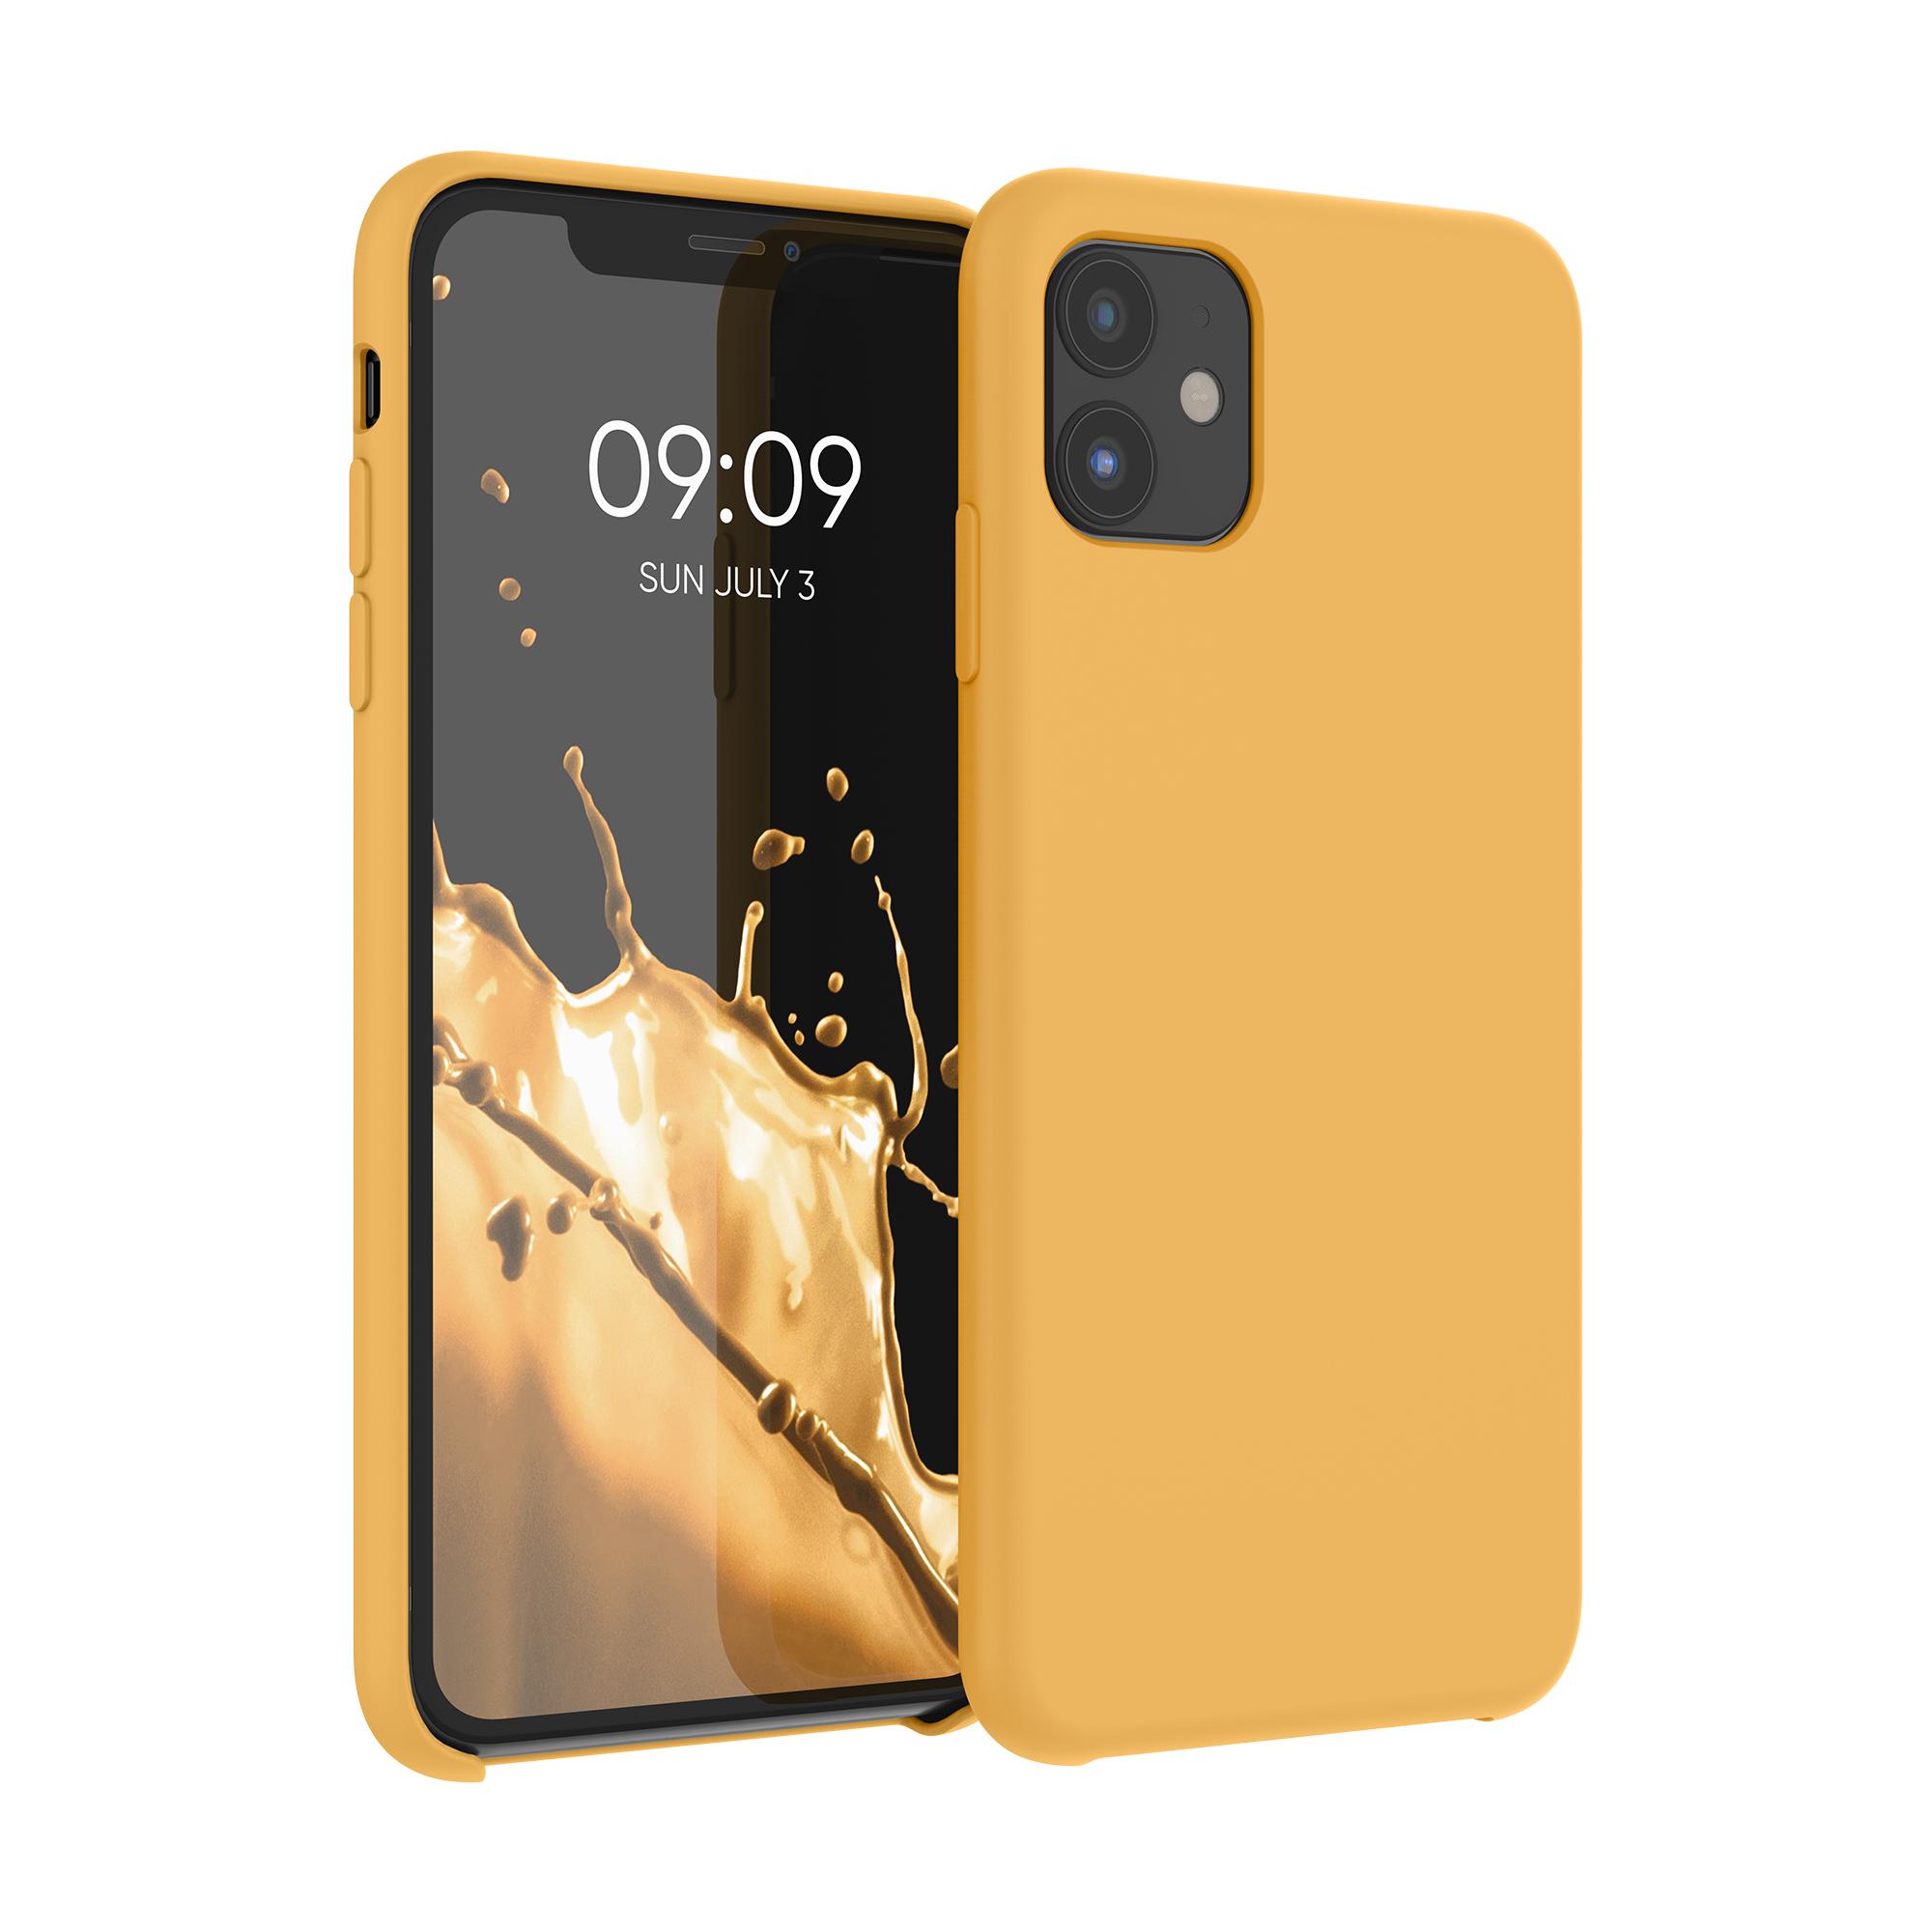 Kvalitní silikonové TPU pouzdro pro Apple iPhone 11 - Saffron Yellow